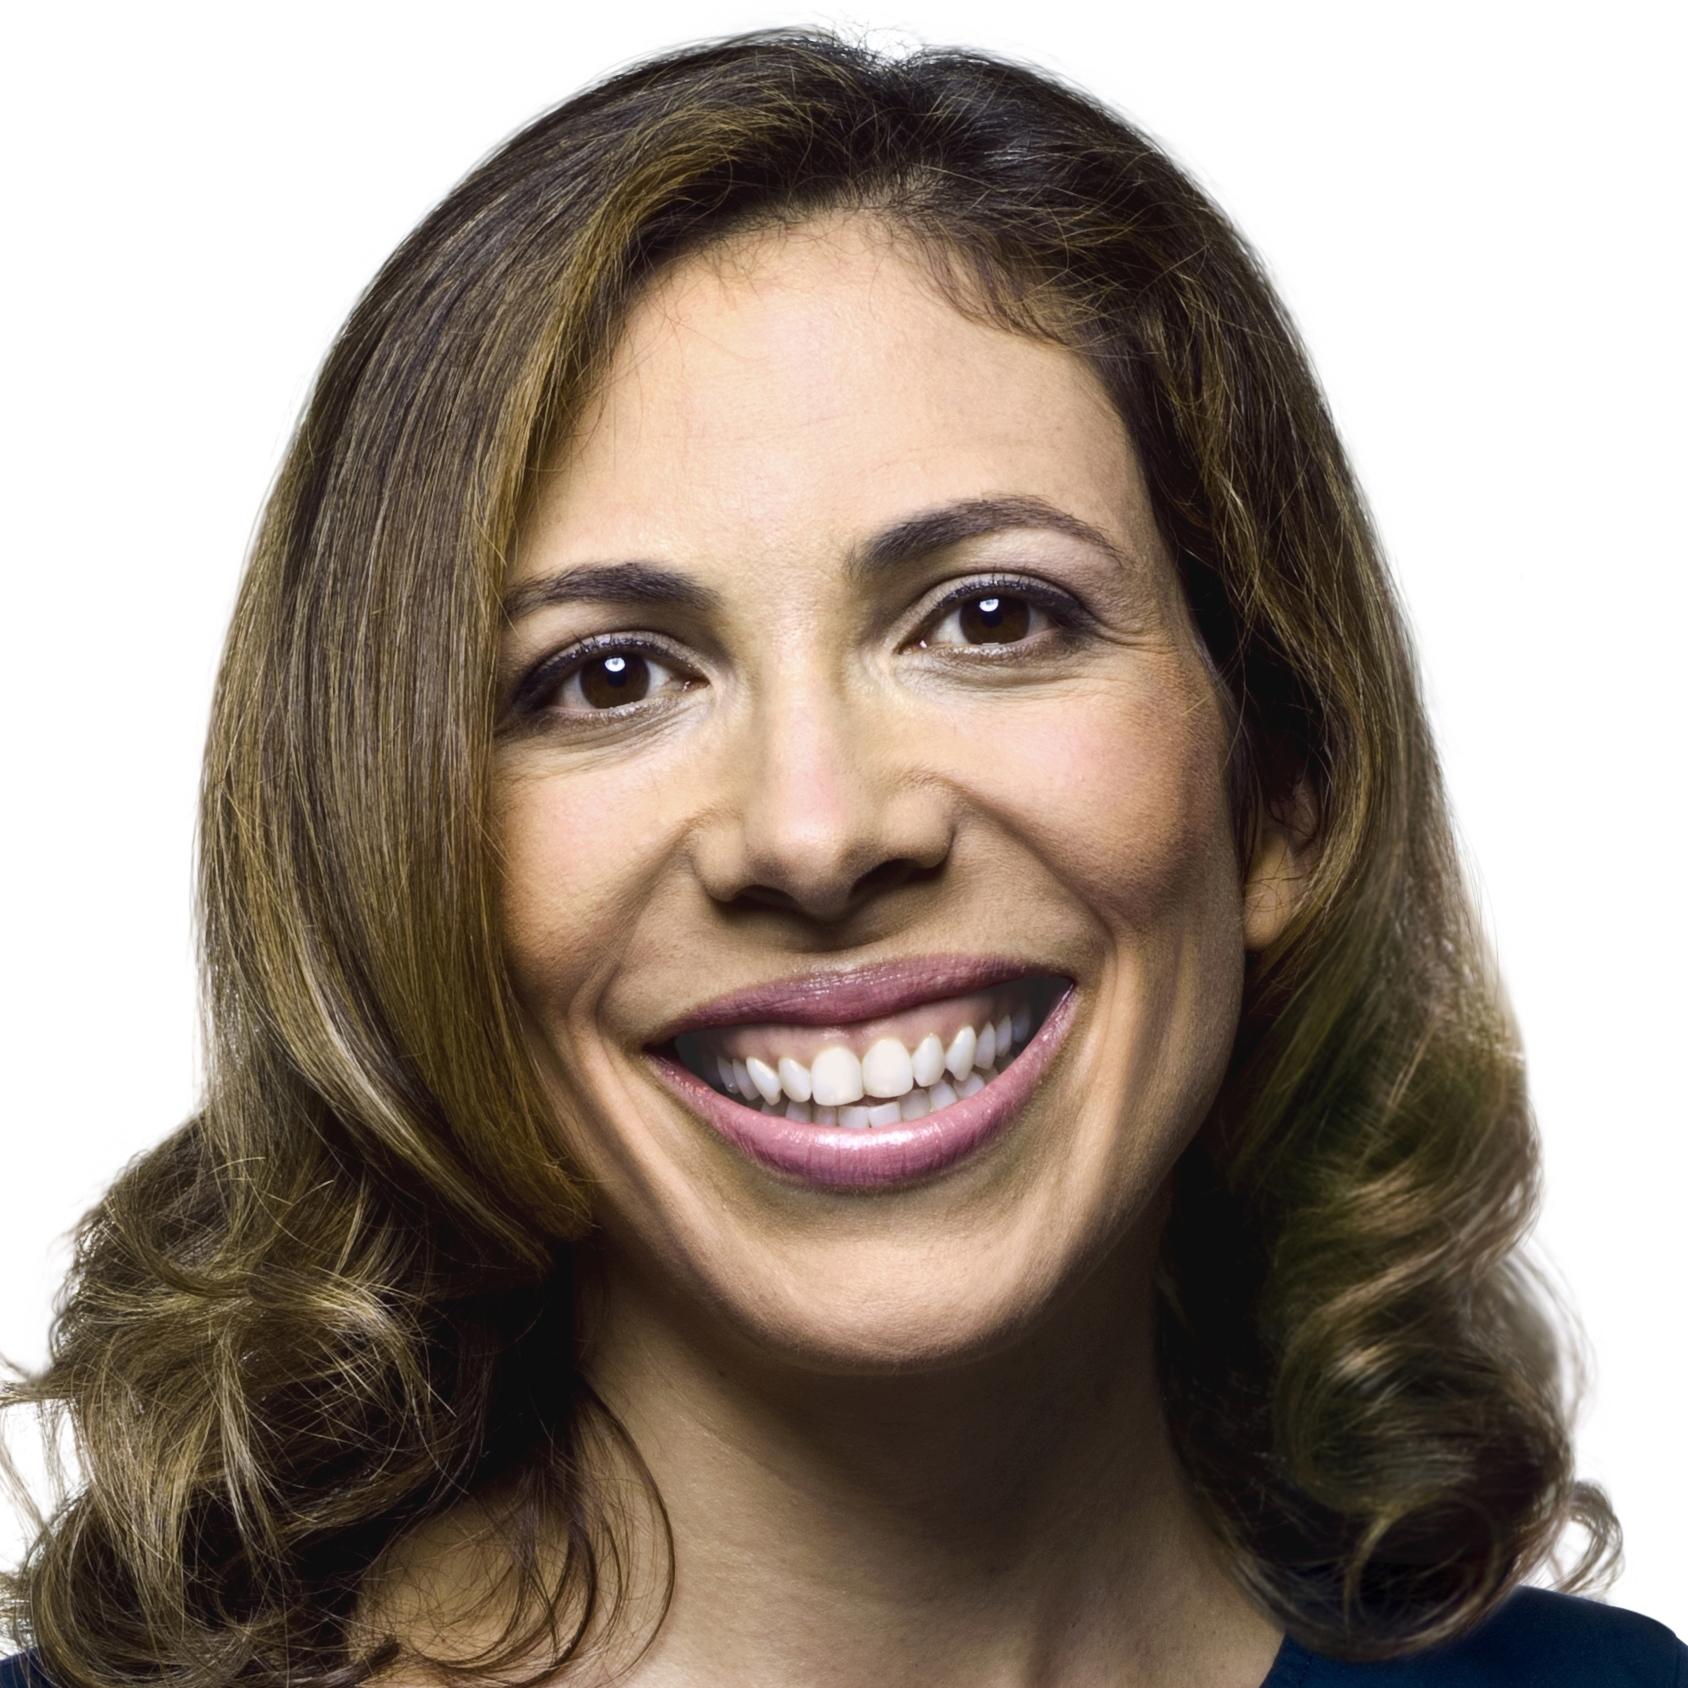 Linda_Rottenberg_Endeavor_High_Impact_Entrepreneurship_SSIR_headshot